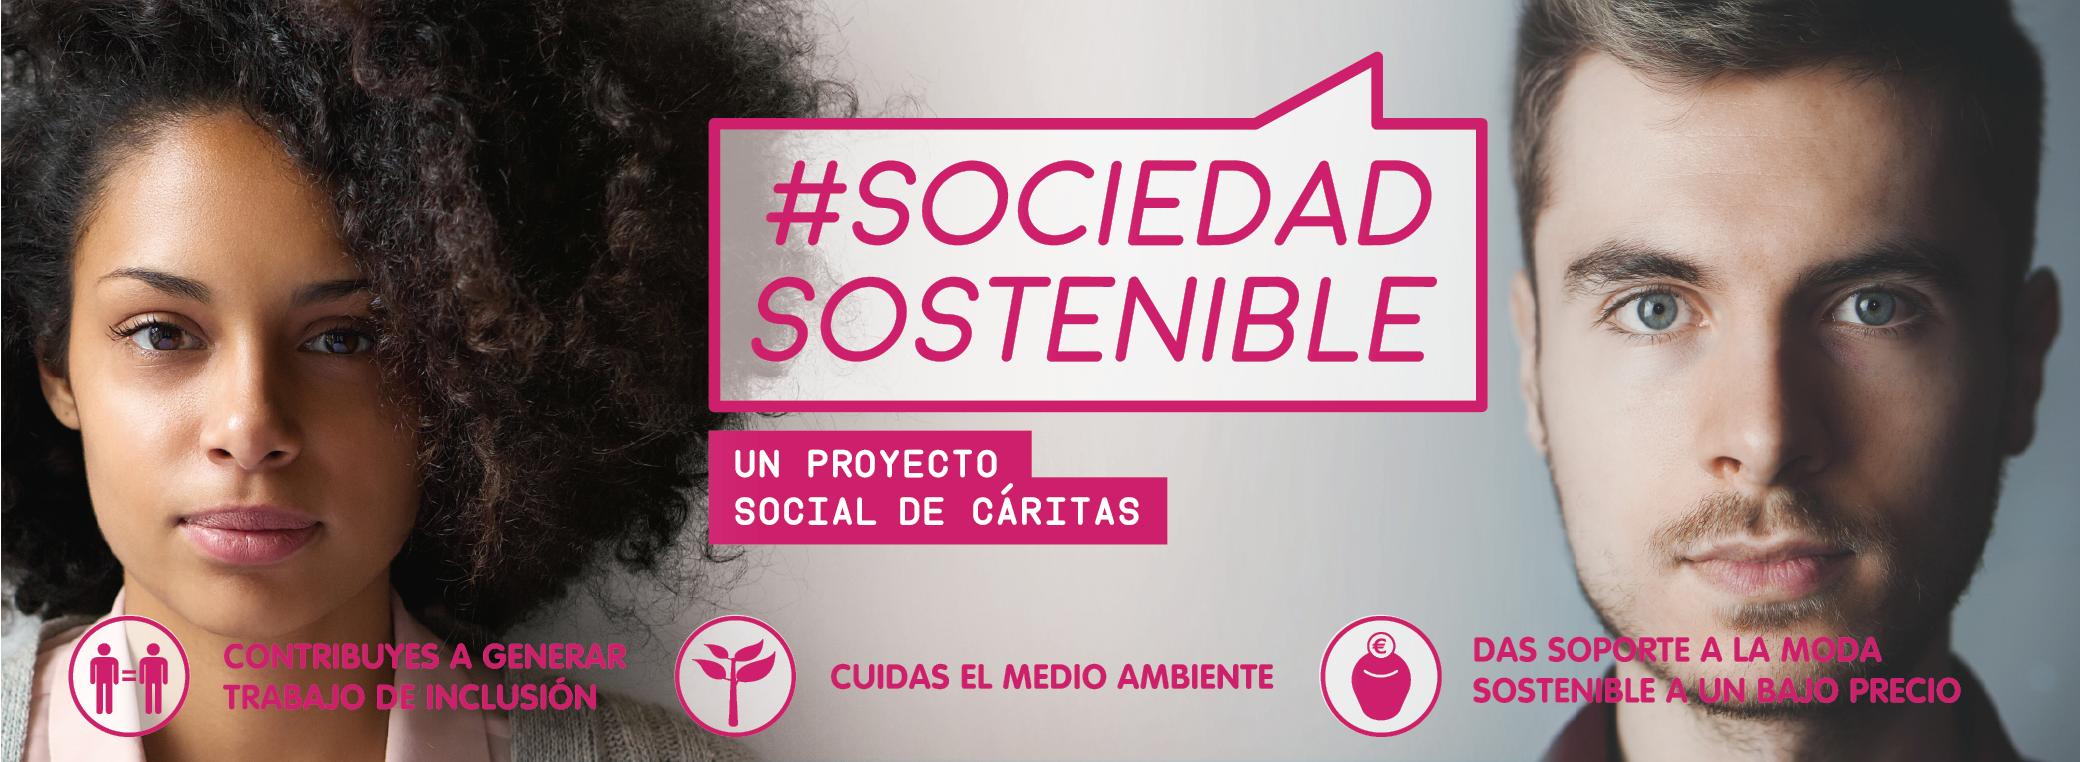 SOC-SOST-Web-v4-01